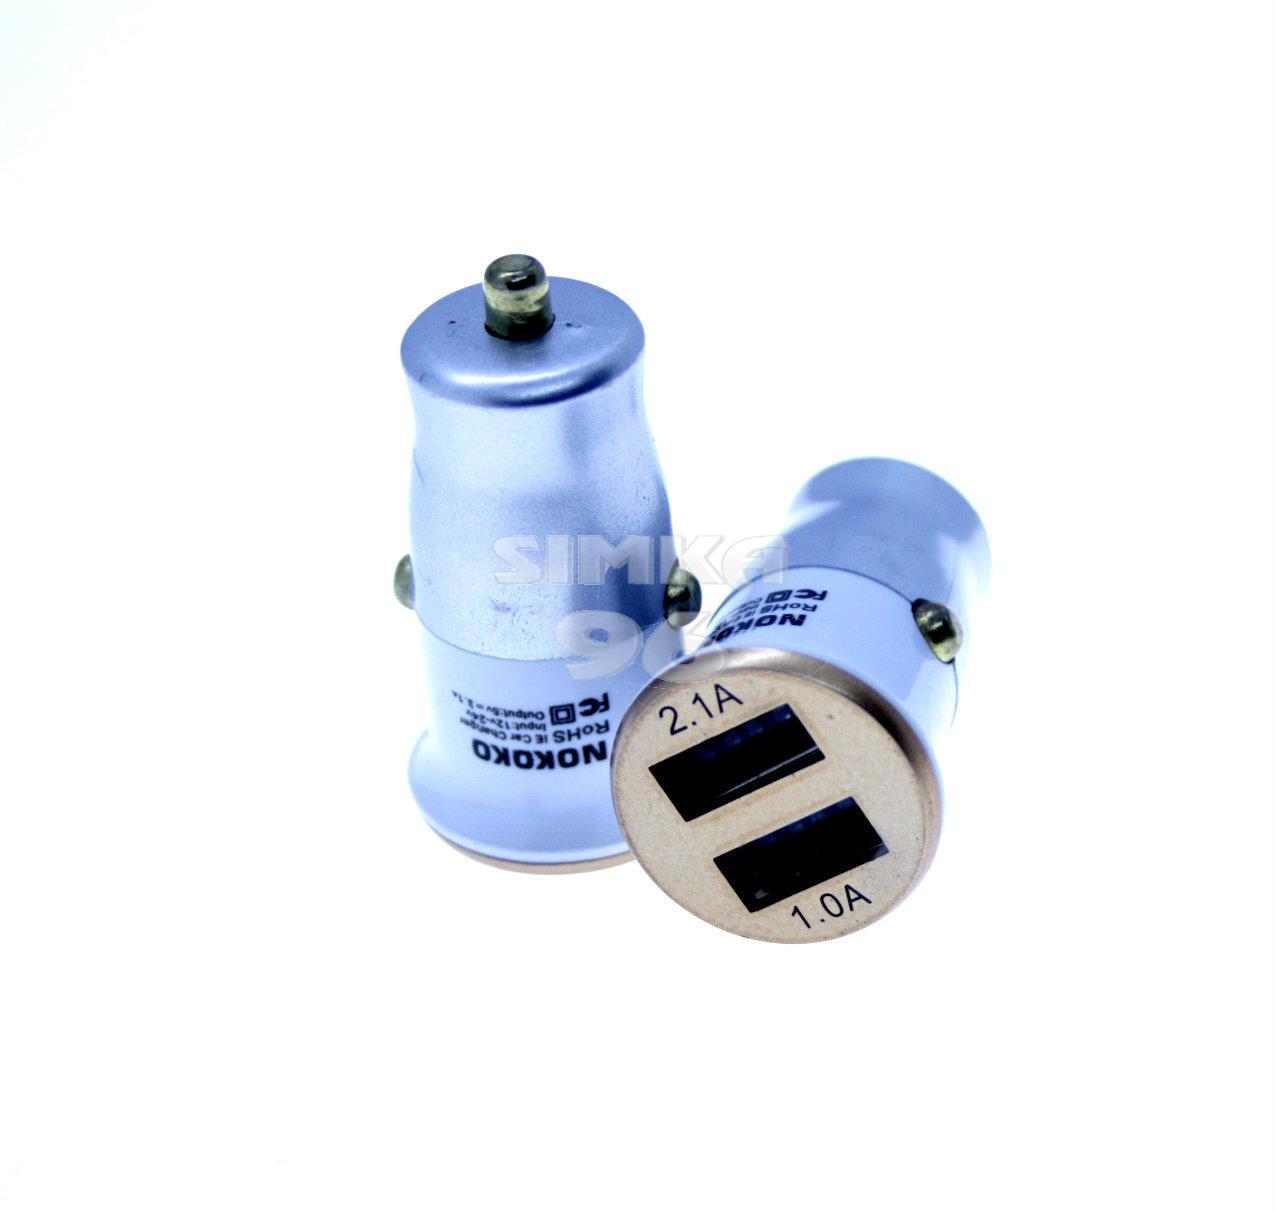 АЗУ  2 выхода USB 2,1А  Nokoko 35